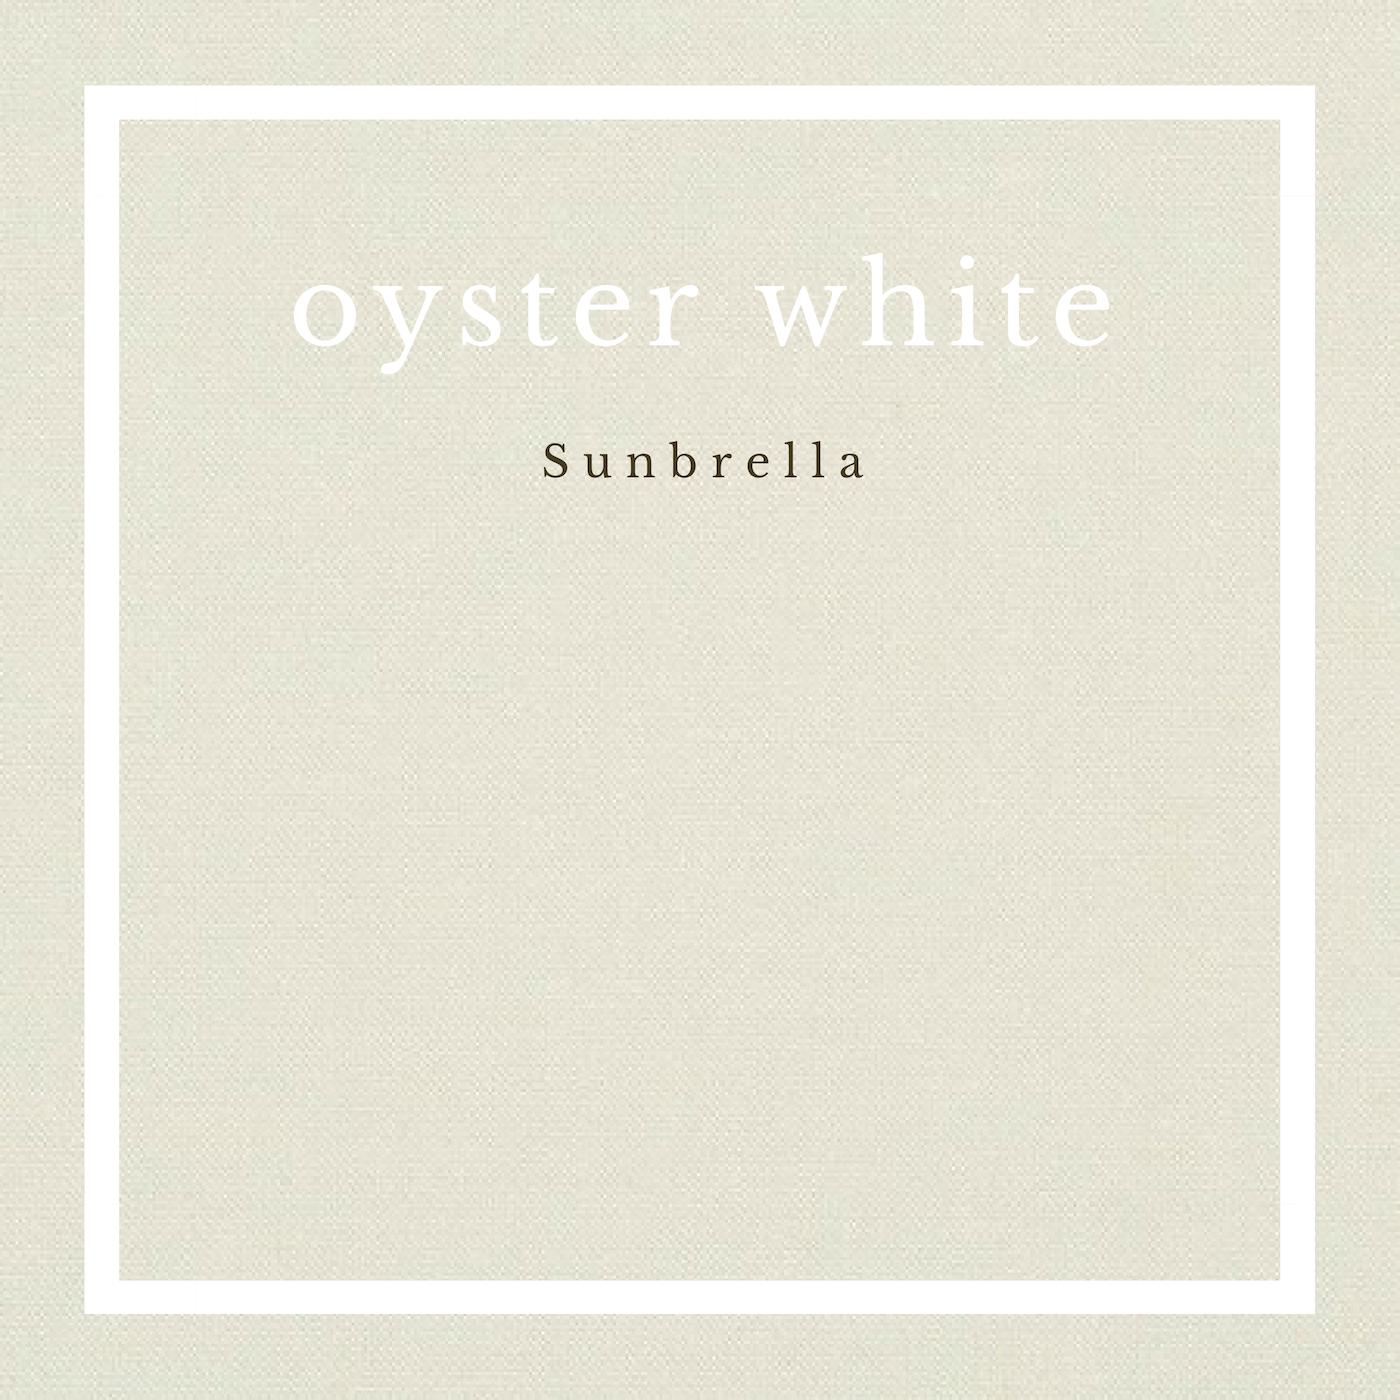 oyster-white-sunbrella.jpg